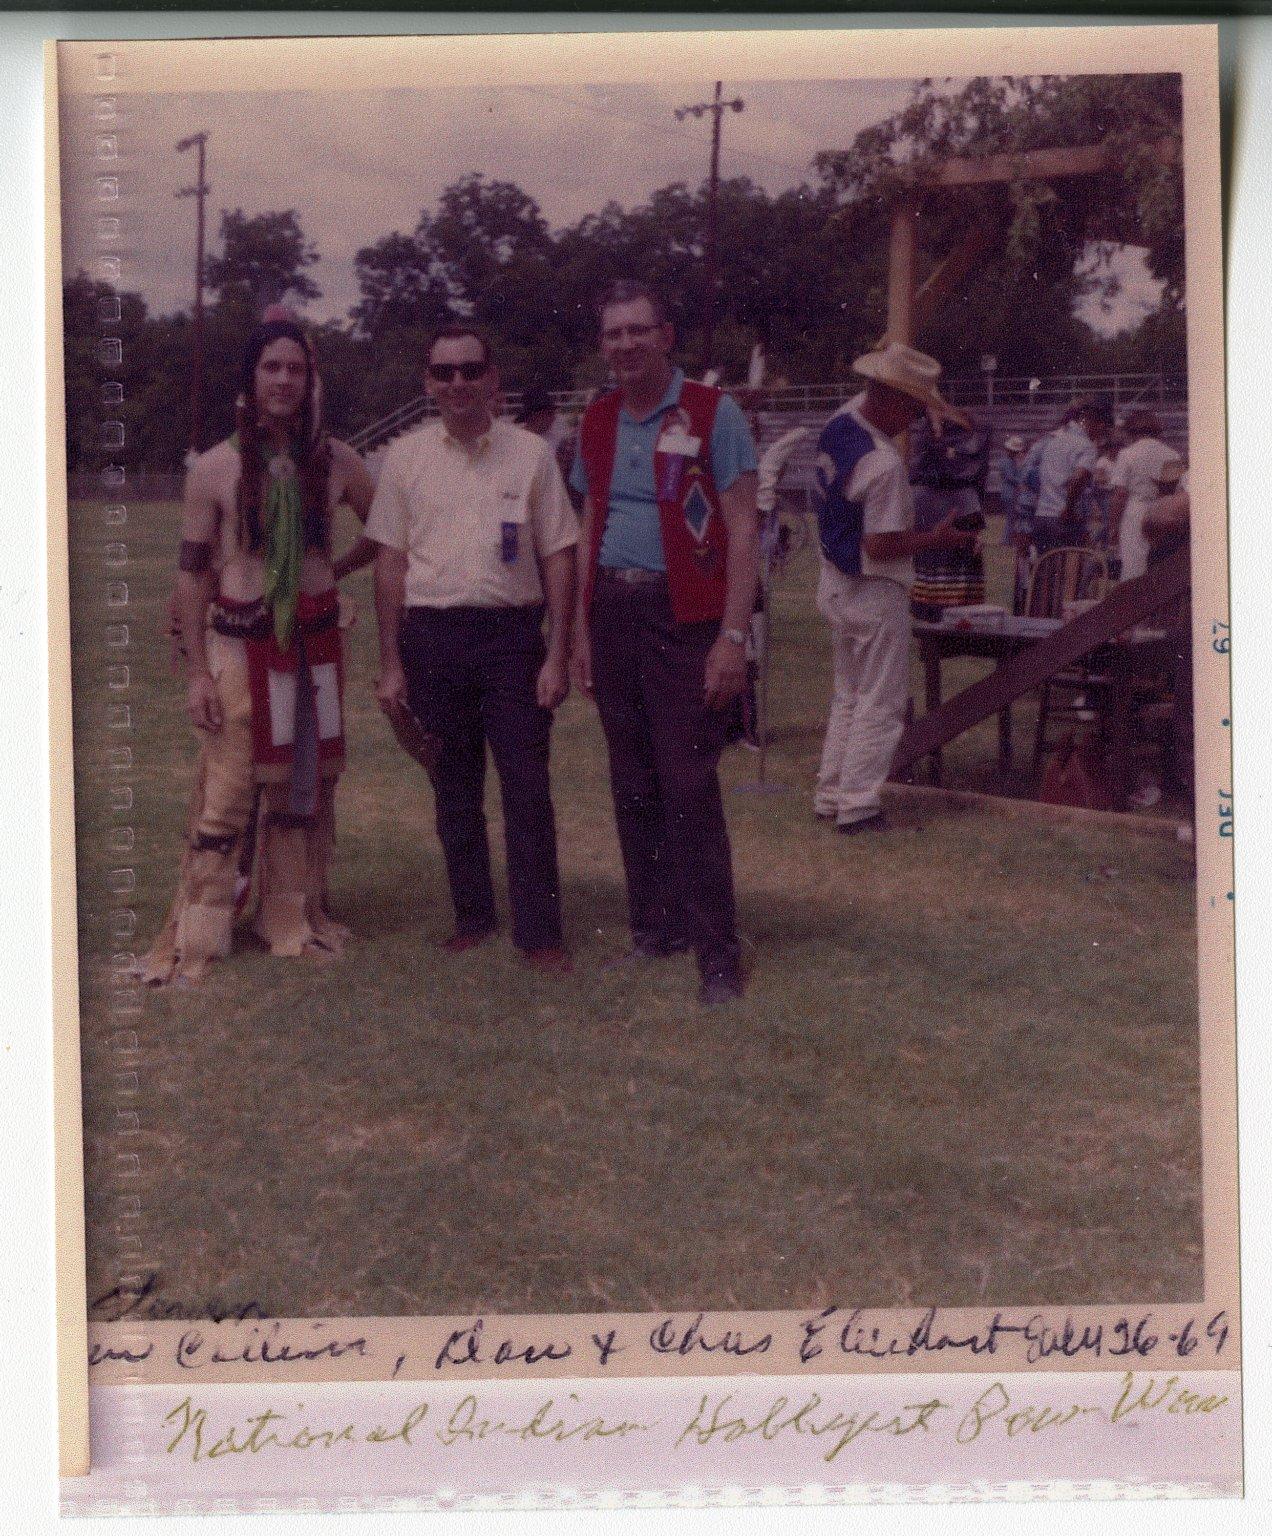 National Indian Hobbyist Pow Wow